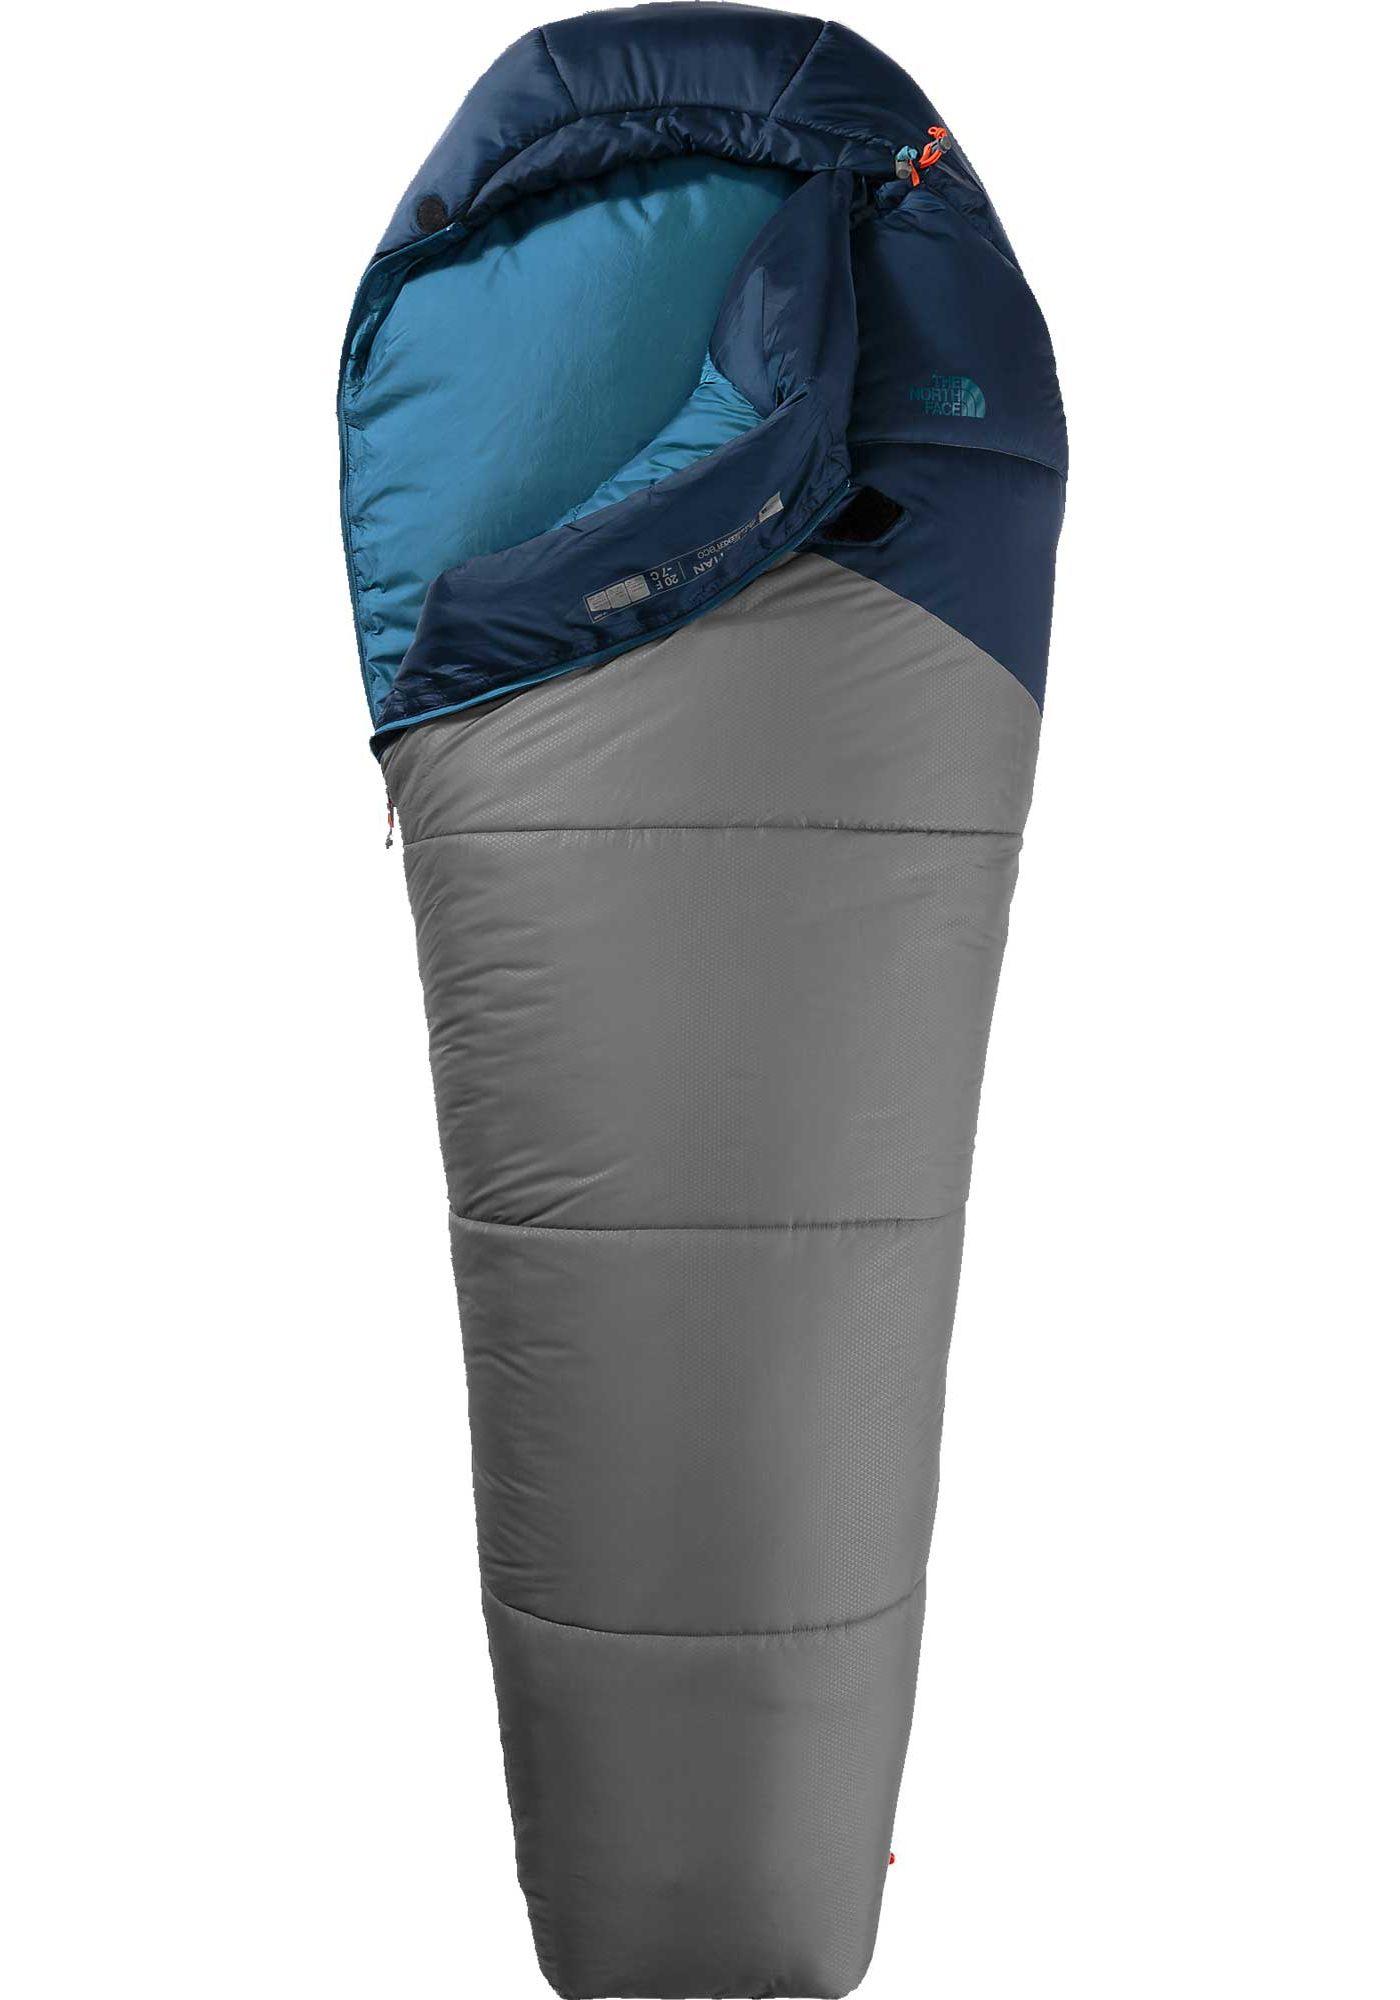 The North Face Aleutian 20°F Sleeping Bag